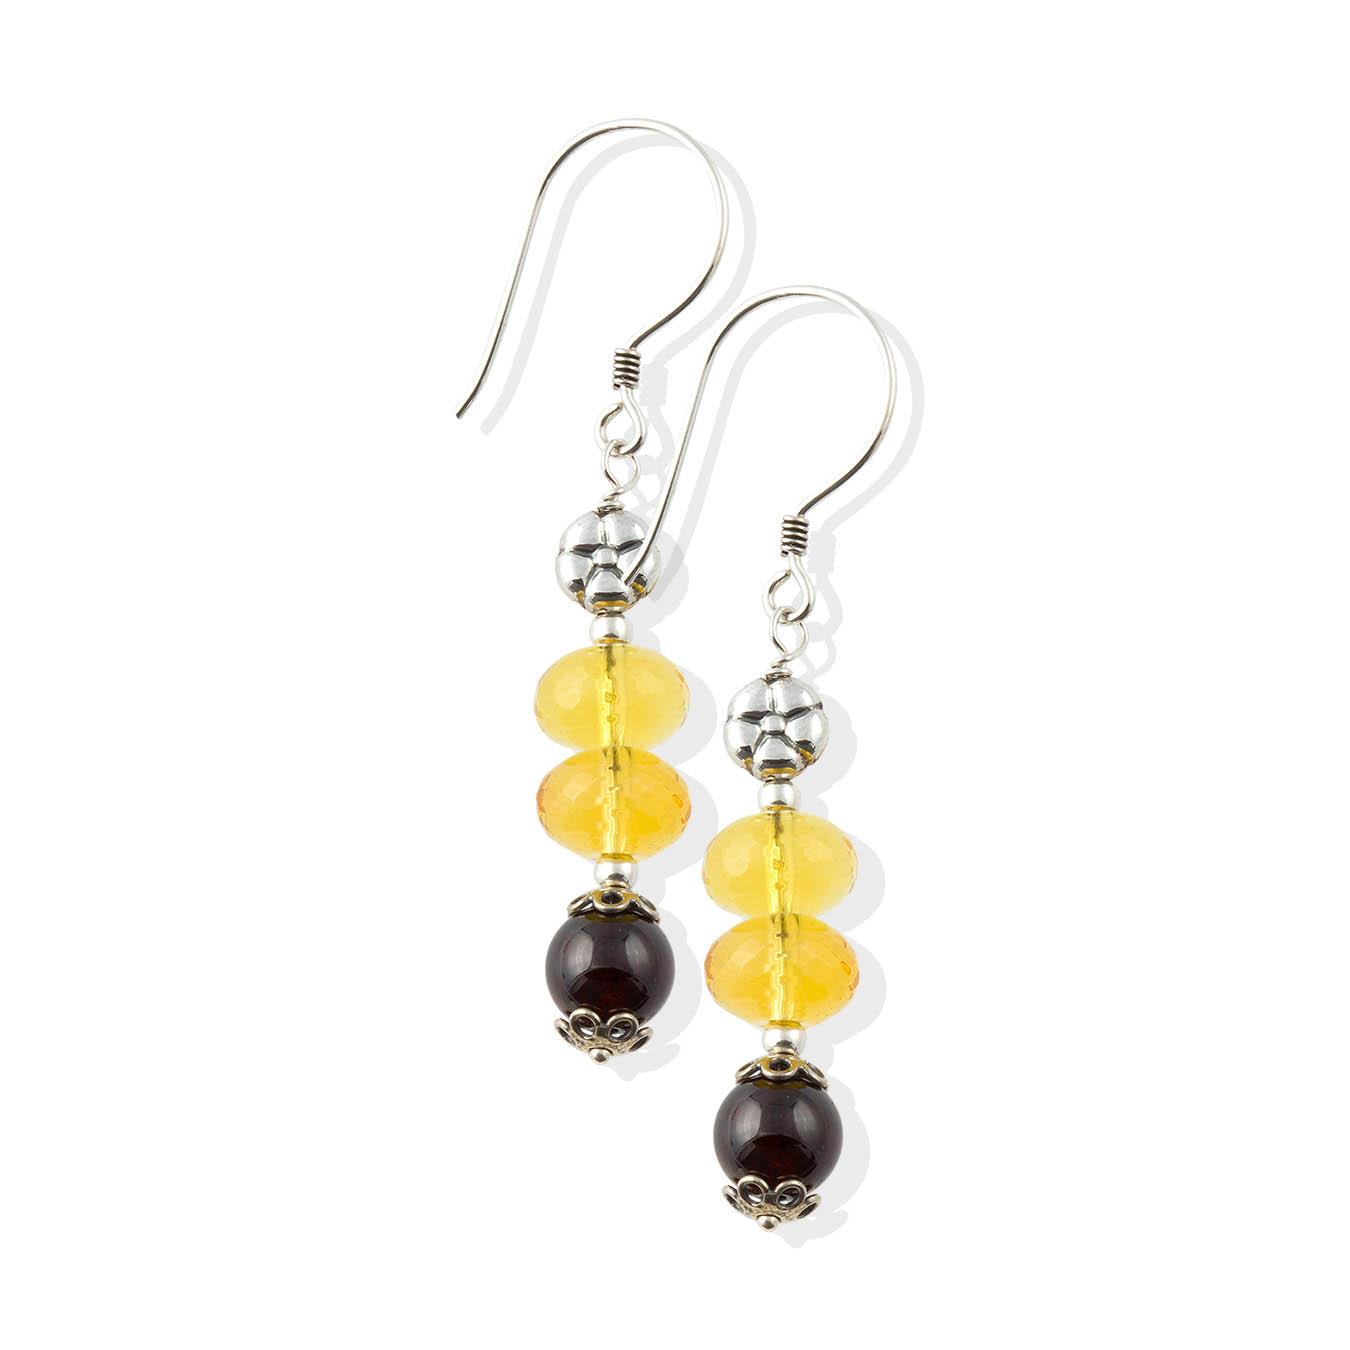 Handcrafted citrine, garnet and bali charm birthstone bead jewelry